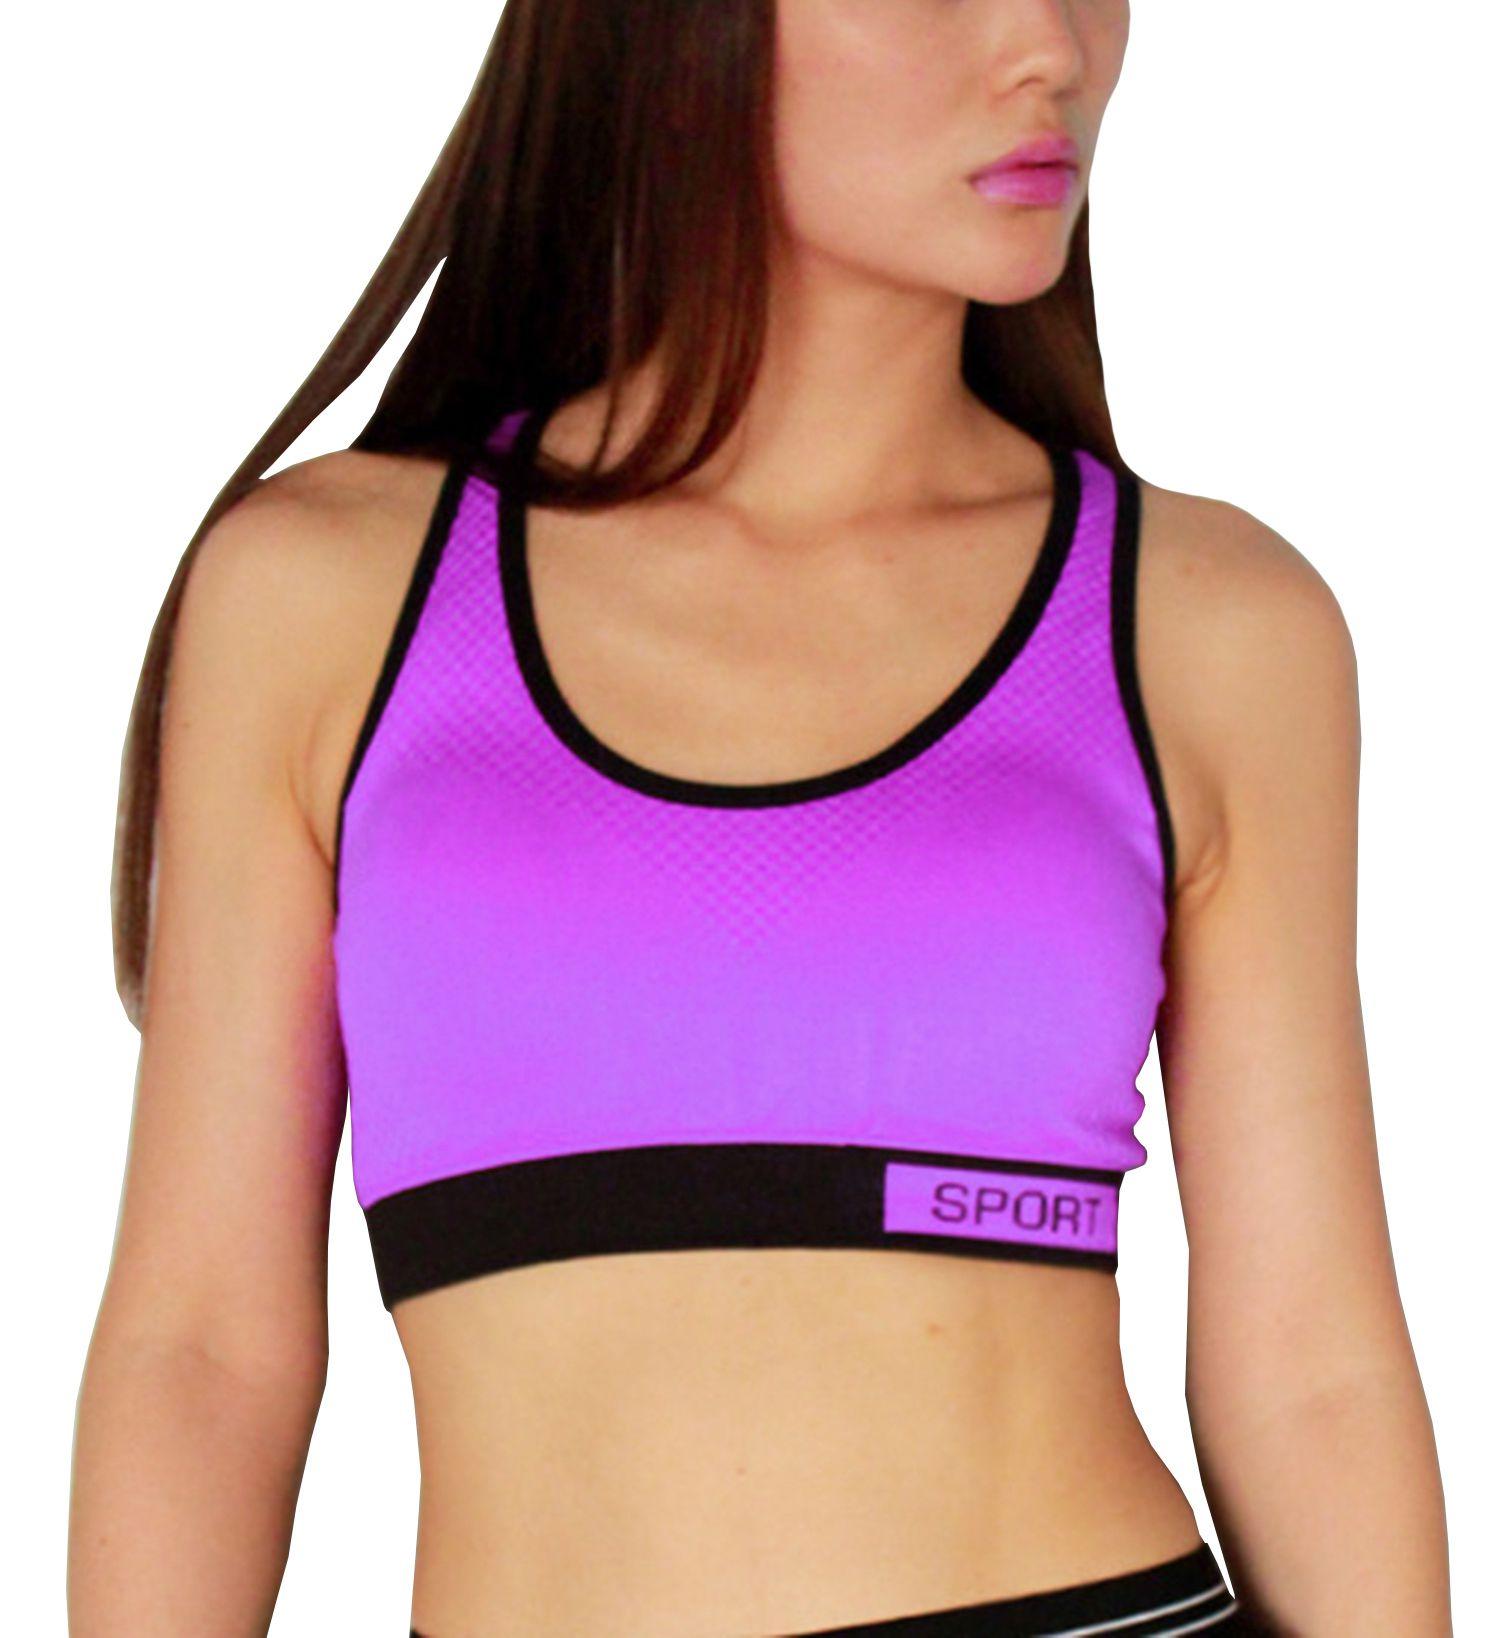 kjk cos Polyester Sports Bra - Purple